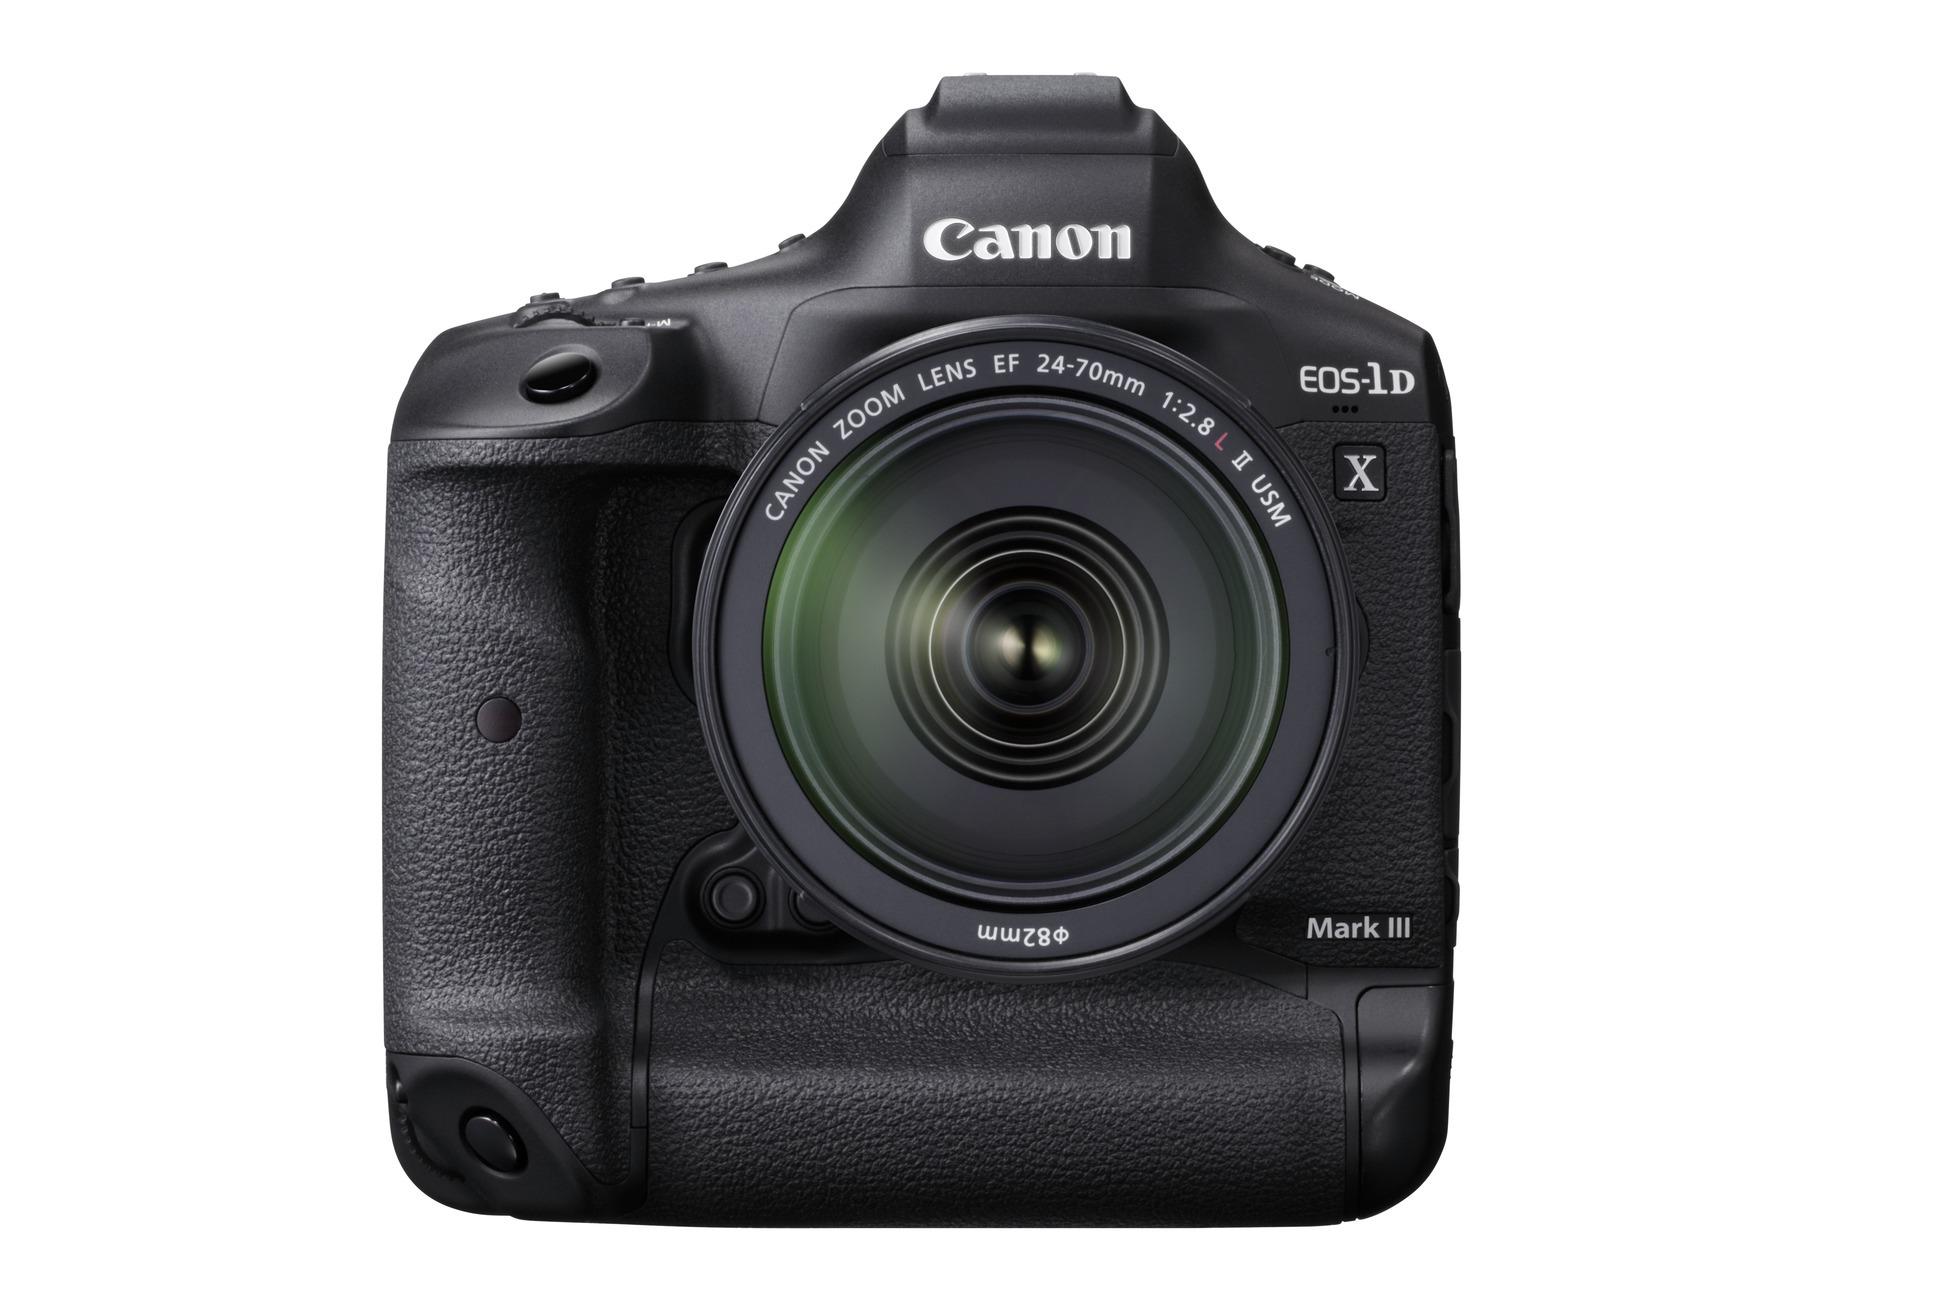 Canon анонсировала разработку камеры EOS-1D X Mark III